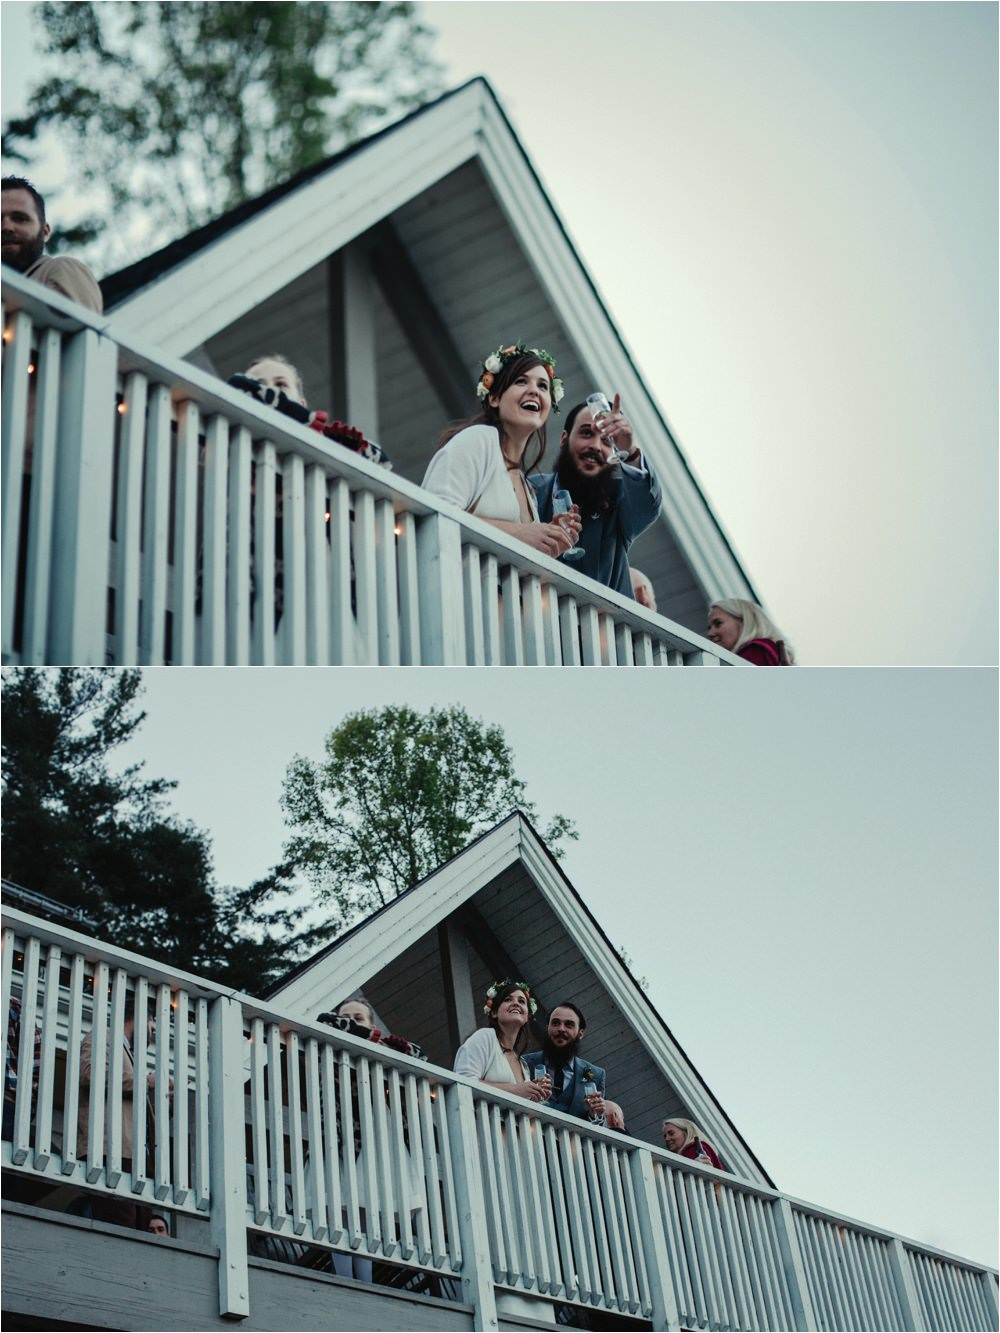 camp-kanuga-hendersonville-nc-wedding-photographers_0070.jpg